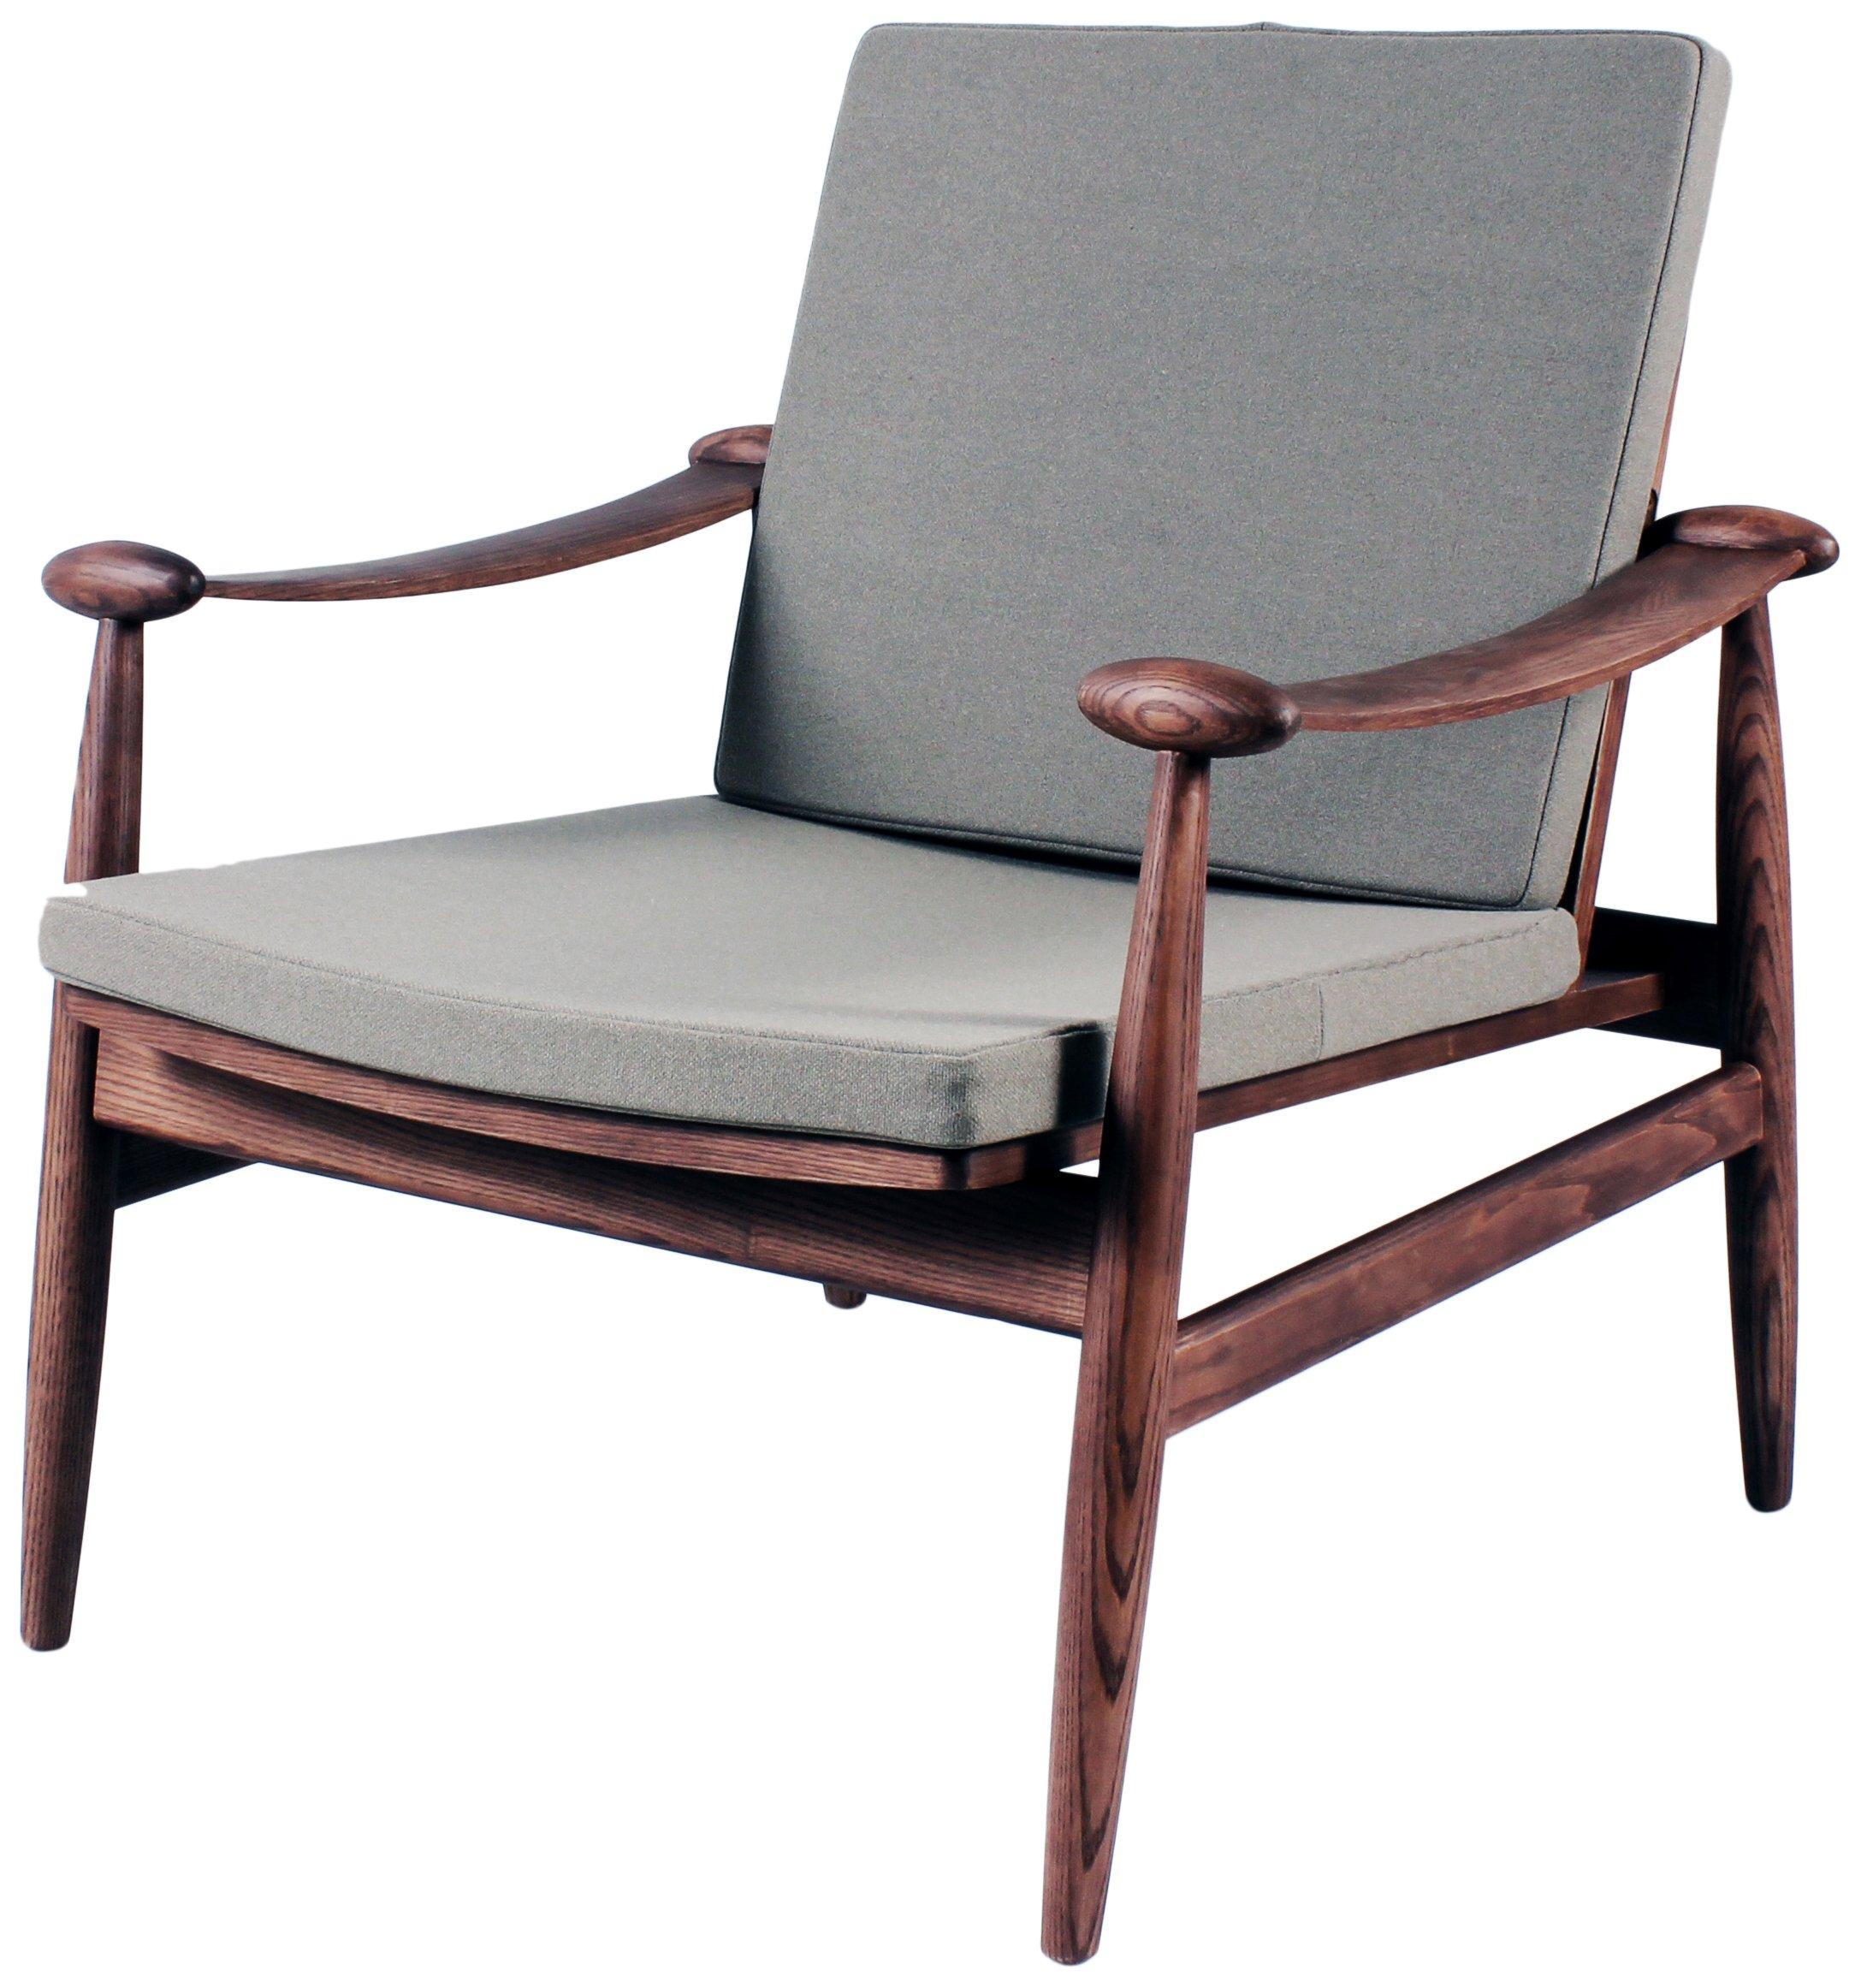 Control Brand Childrens Mid Century Side Chair in Polypropylene/Steel Eiffel Base